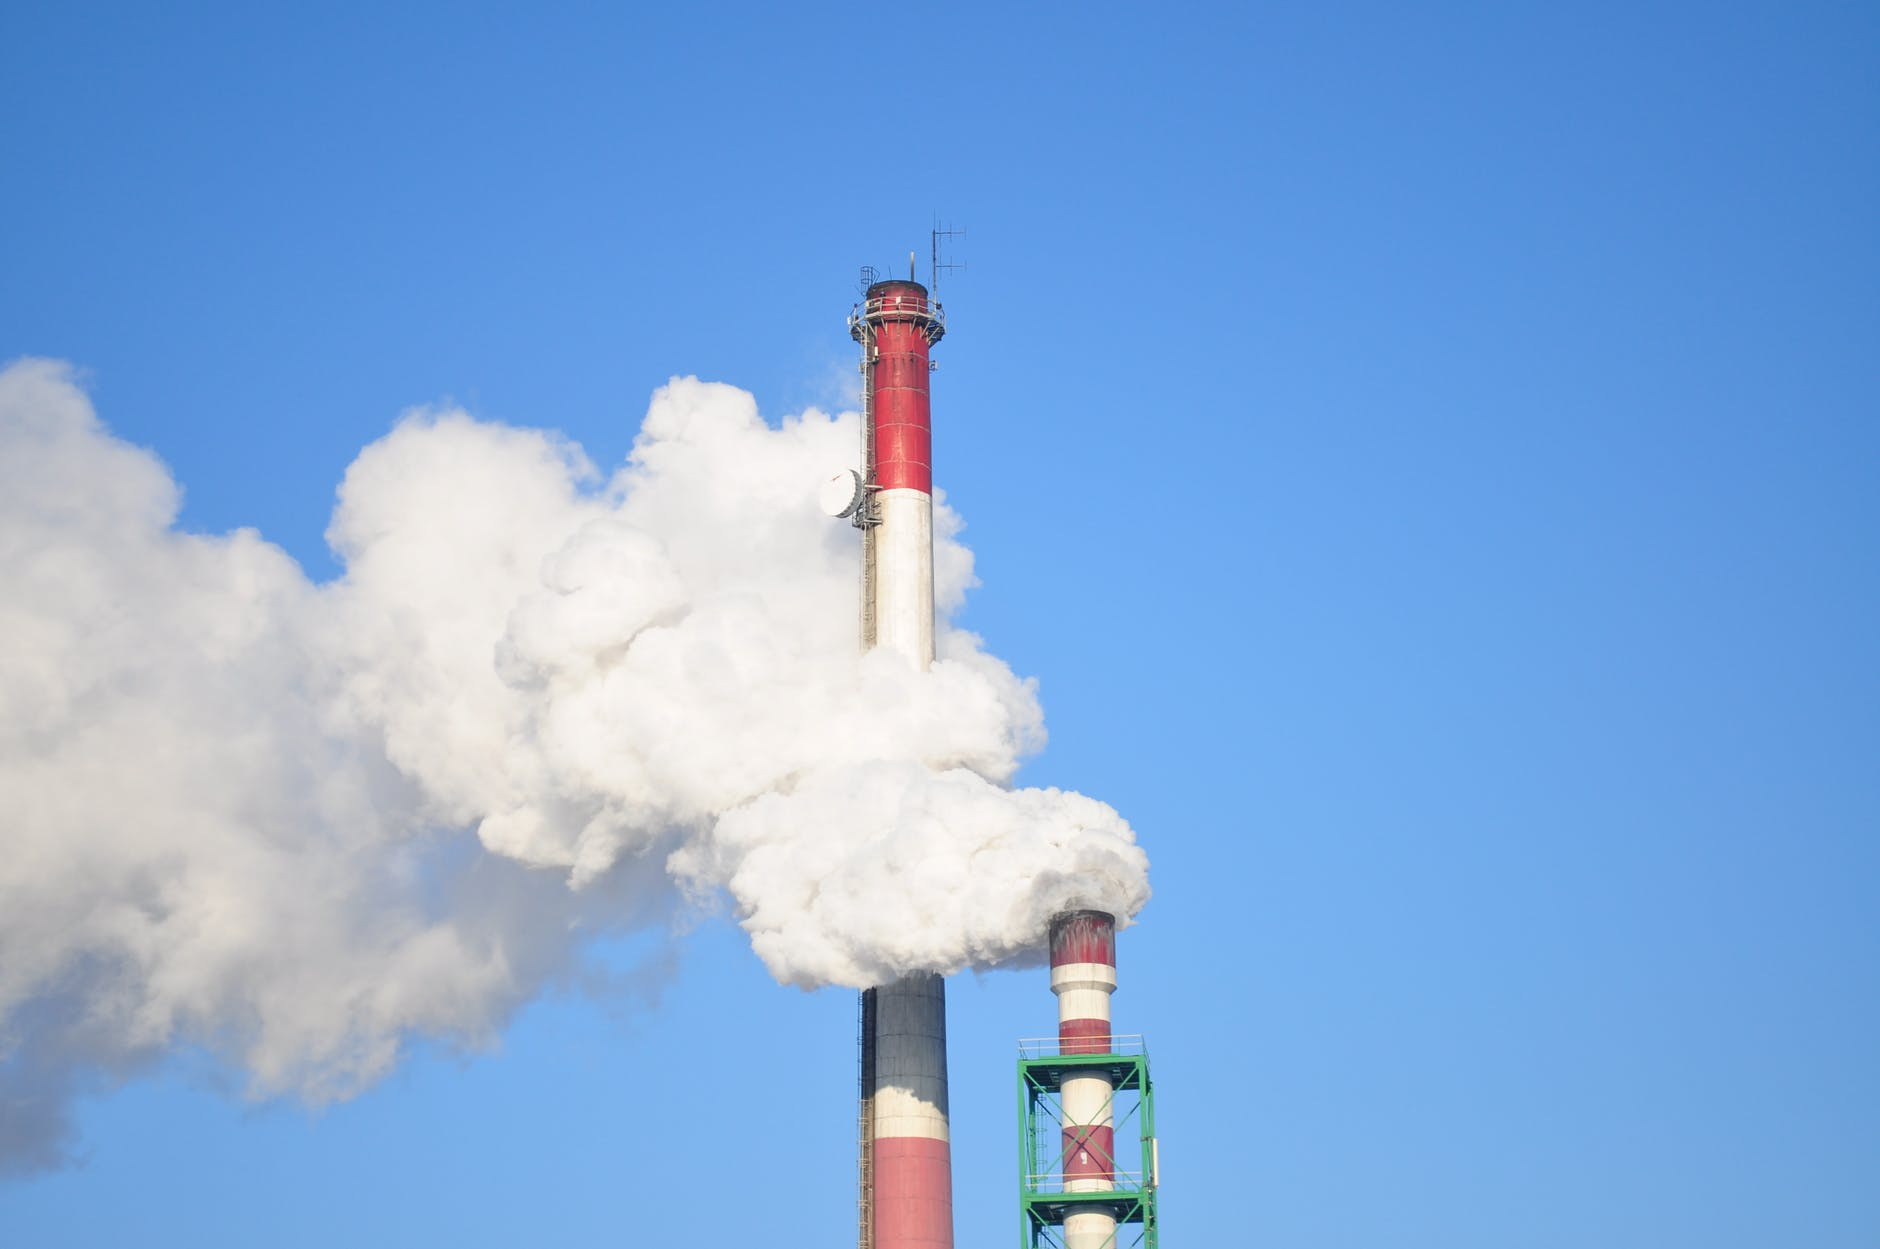 smoke stacks against blue sky